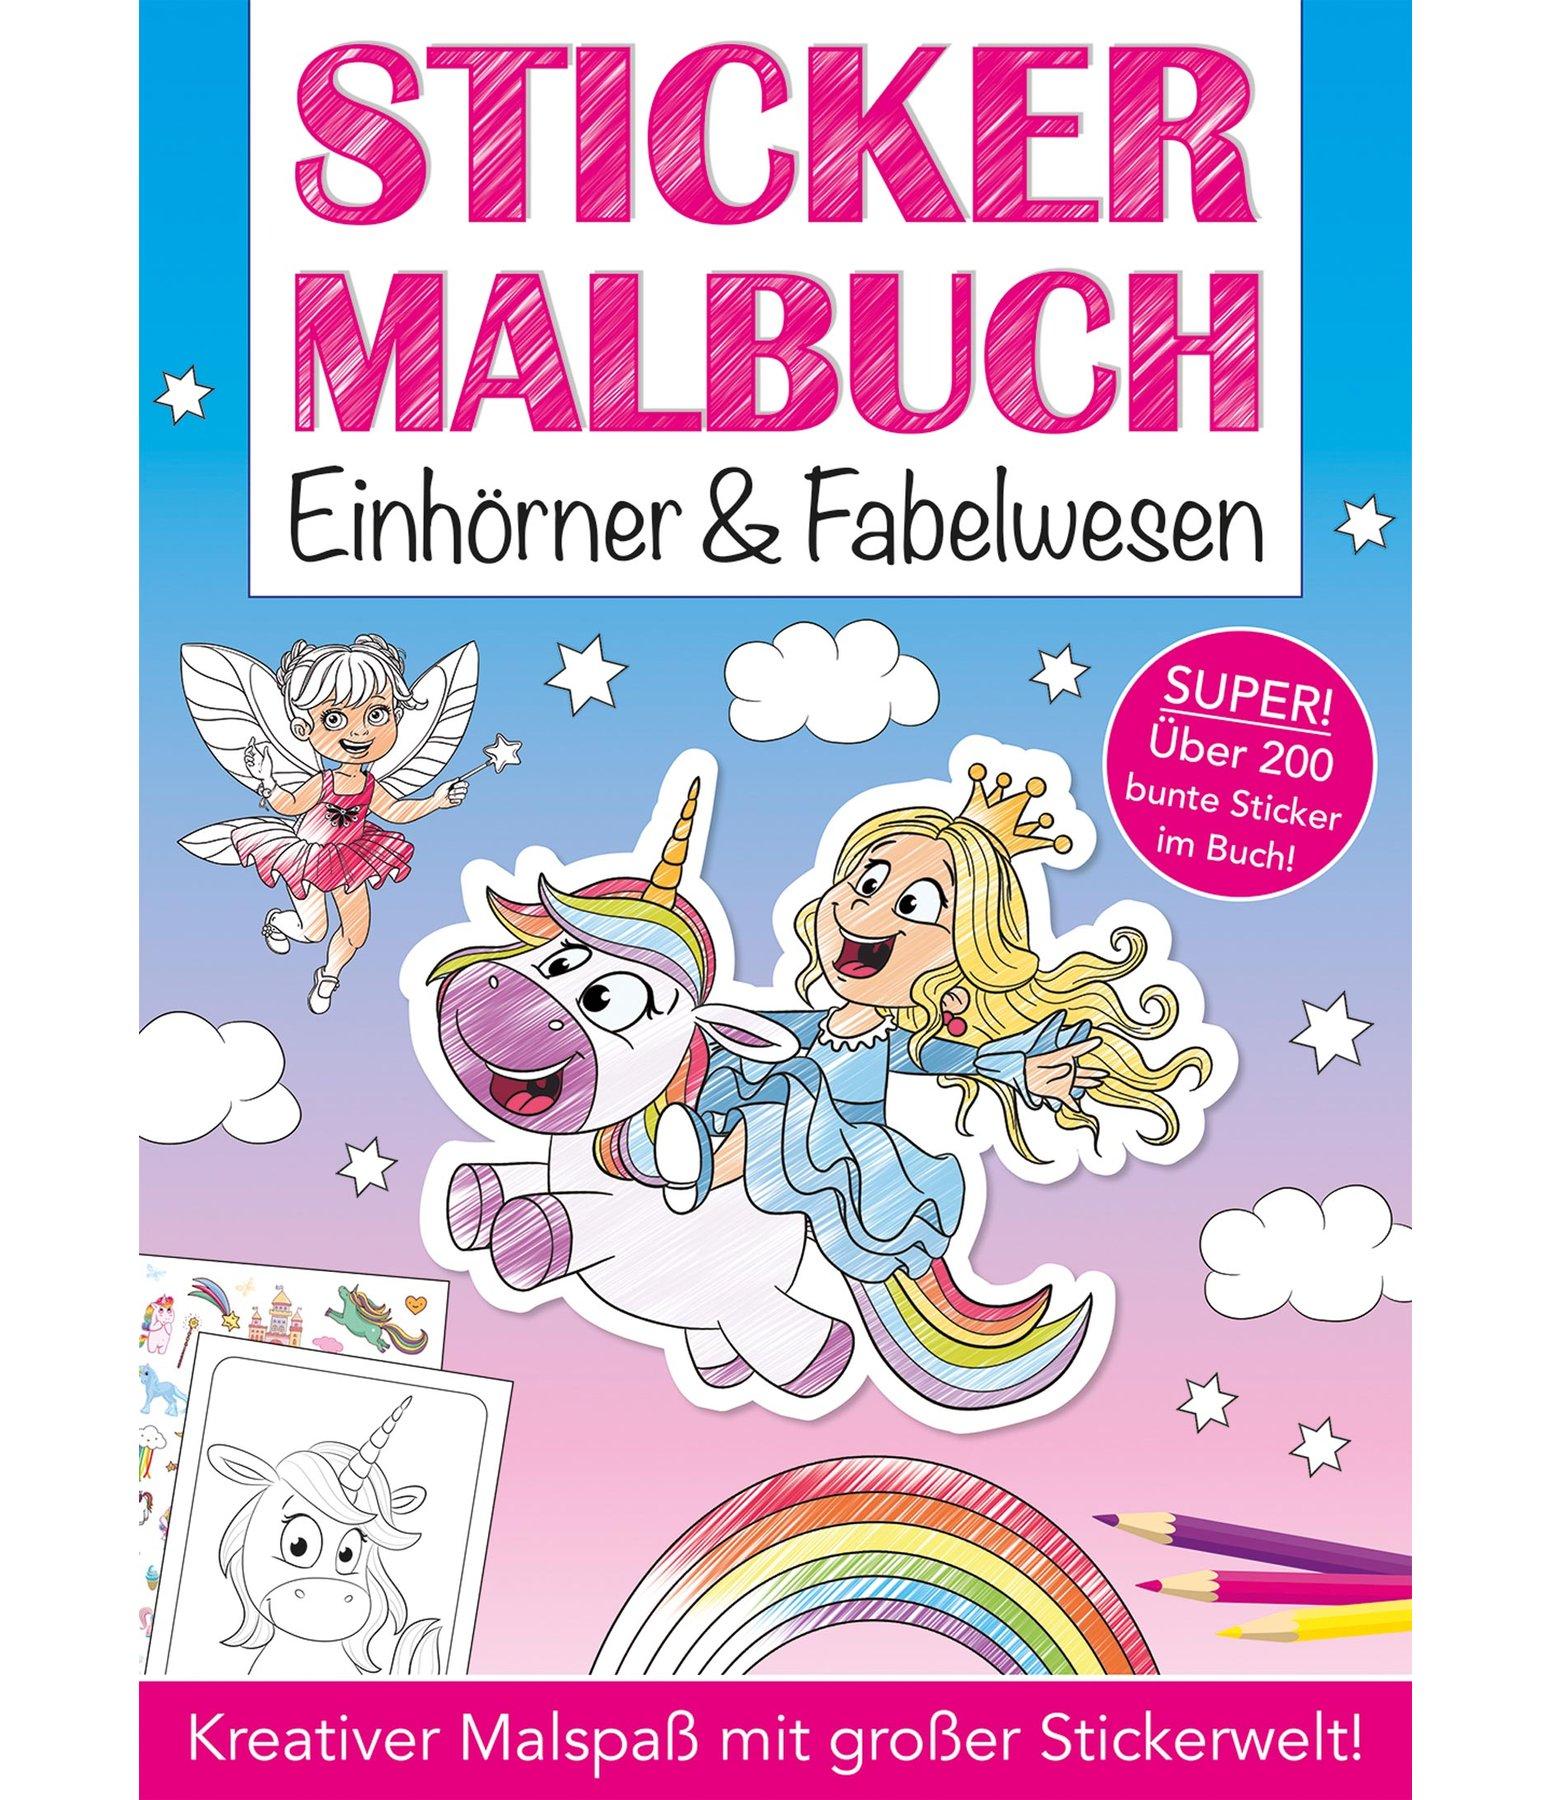 Sticker Malbuch Einhörner & Fabelwesen - Kinderbücher - Krämer ...